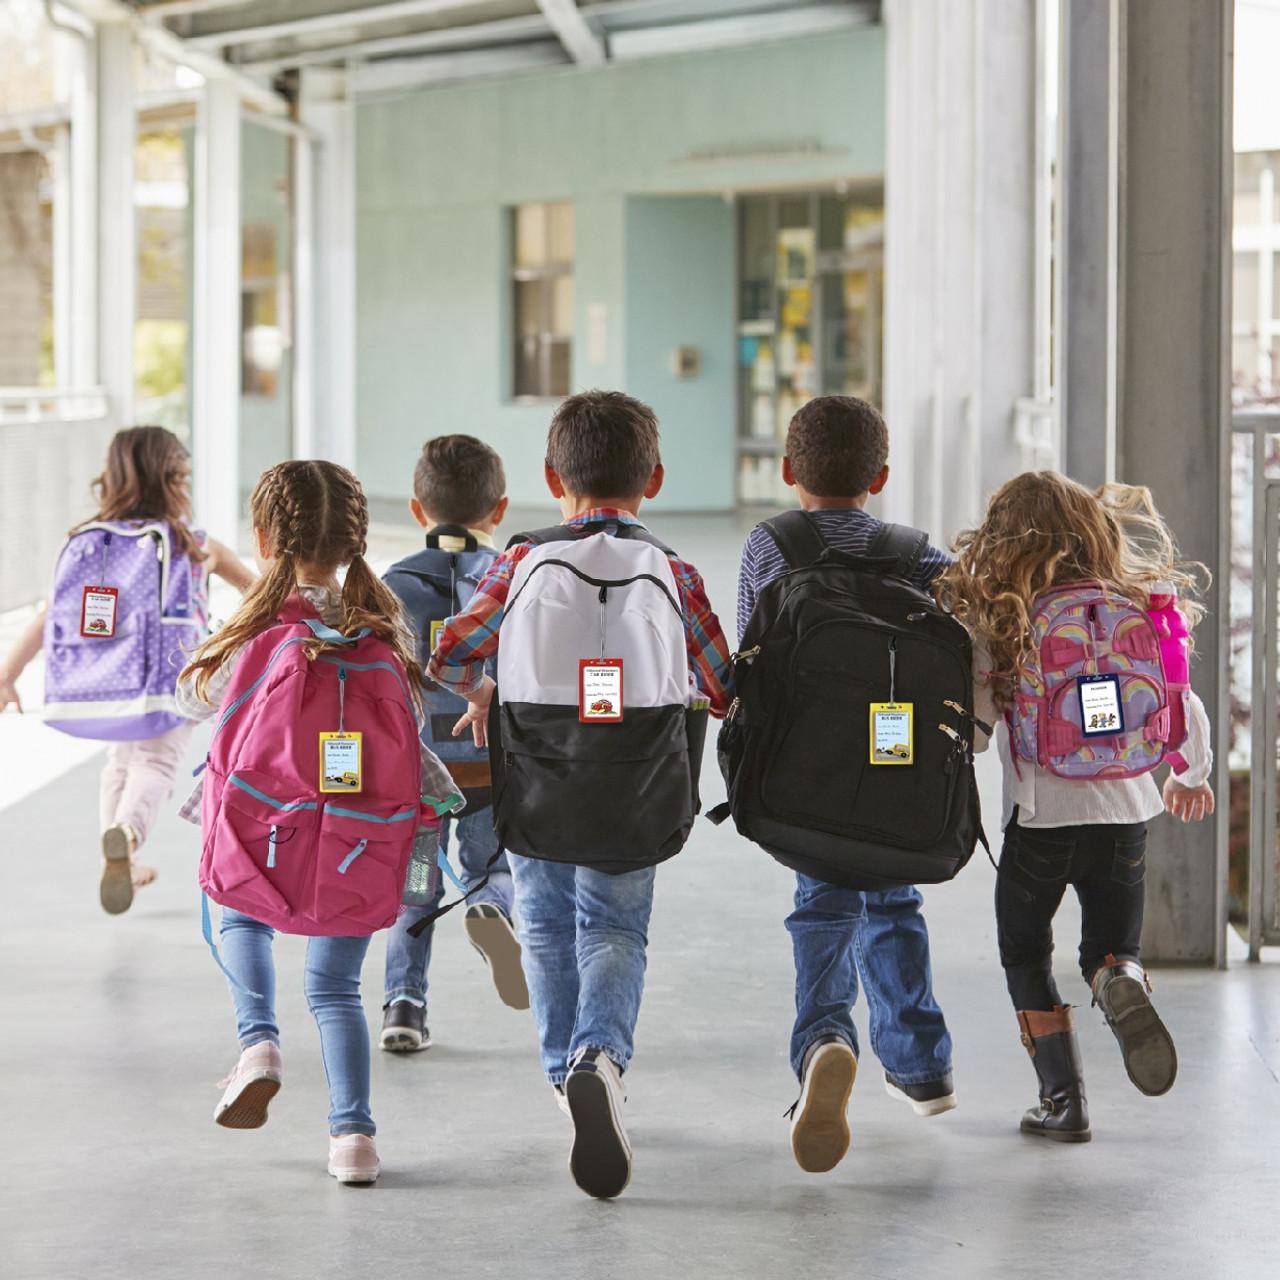 Bus Tag / Student ID Tags Custom Layout